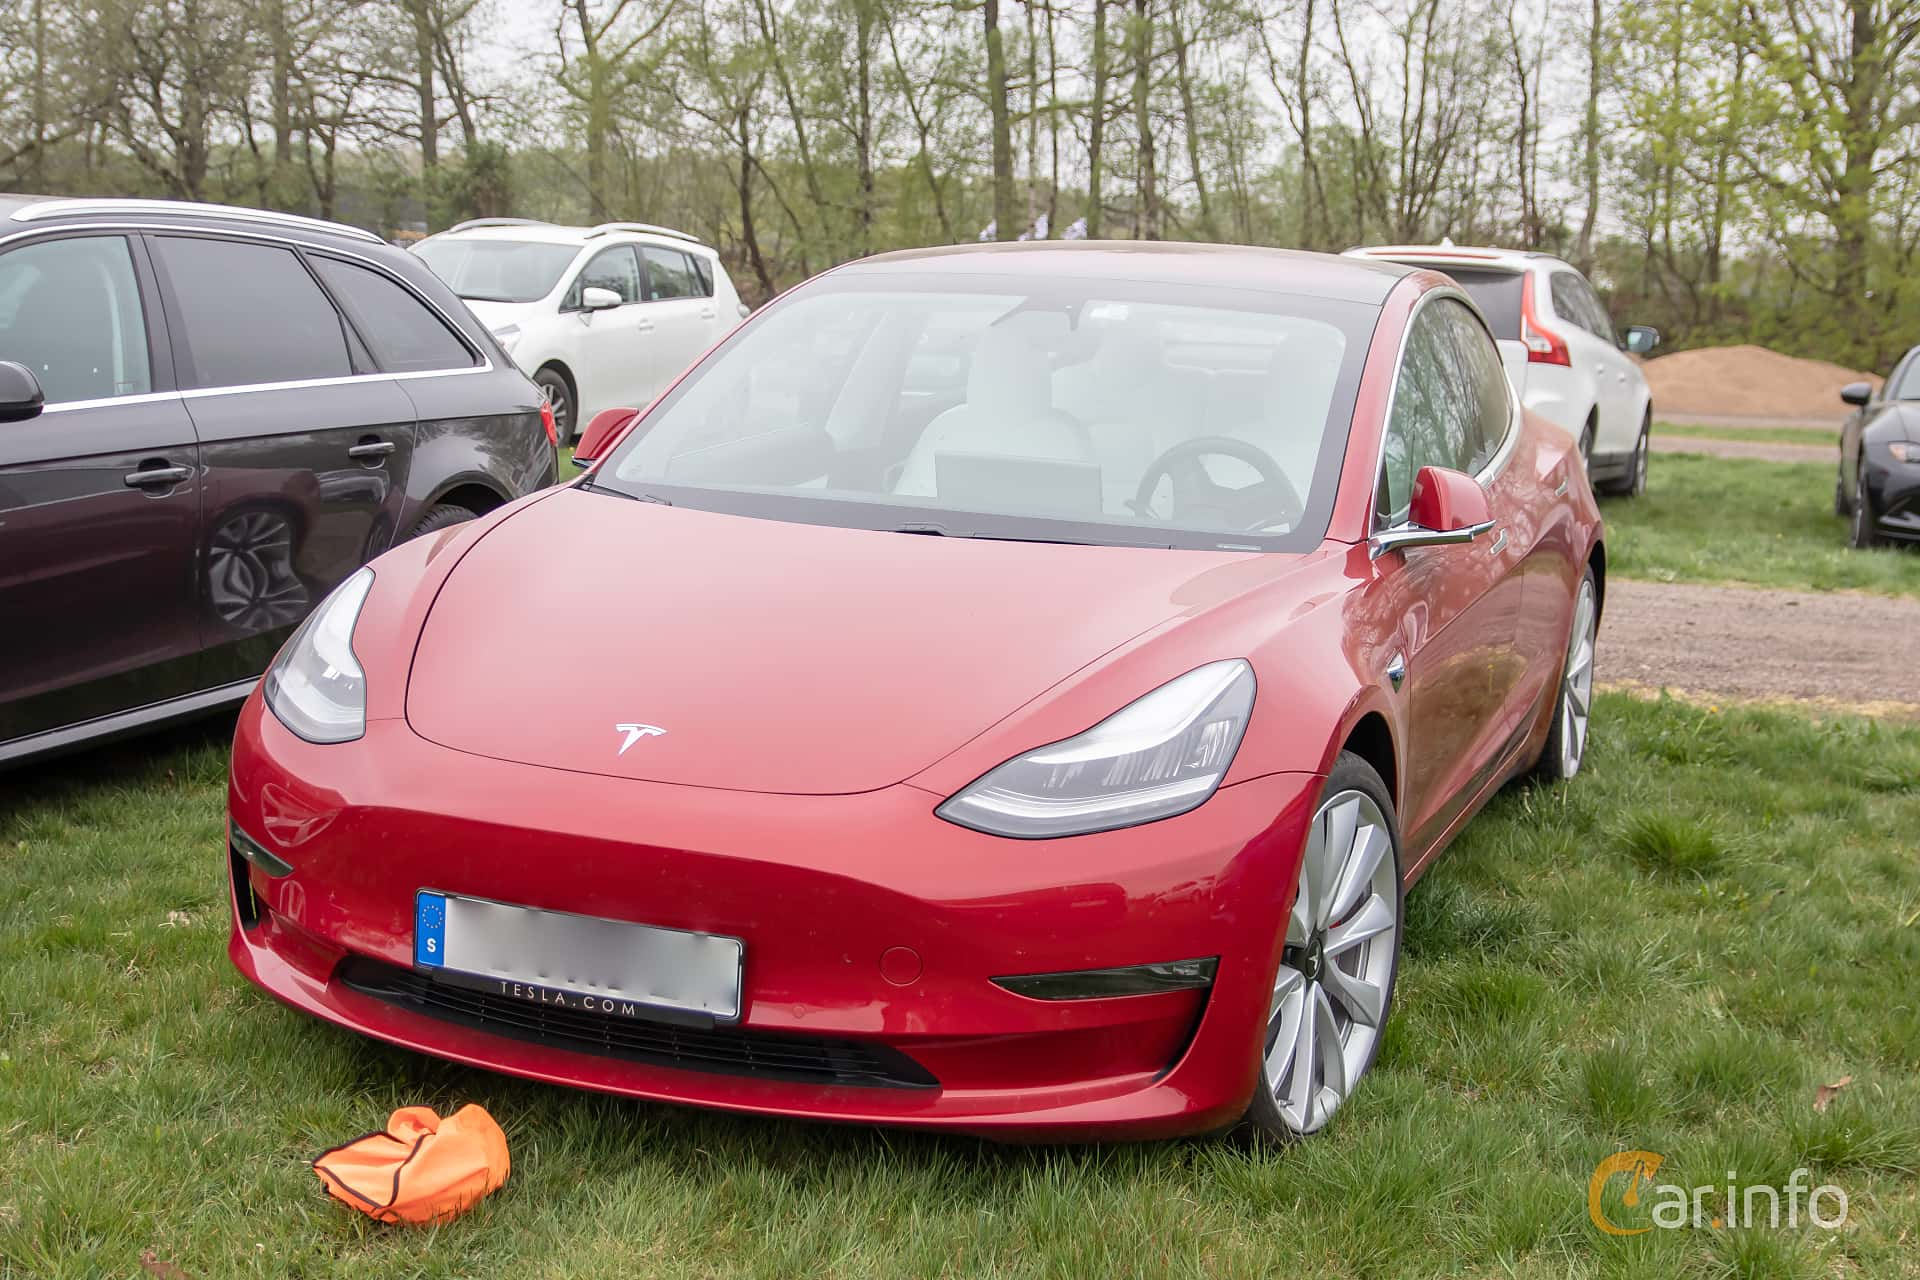 Tesla Model 3 Performance 75 kWh Single Speed, 462hp, 2019 at Lucys motorfest 2019